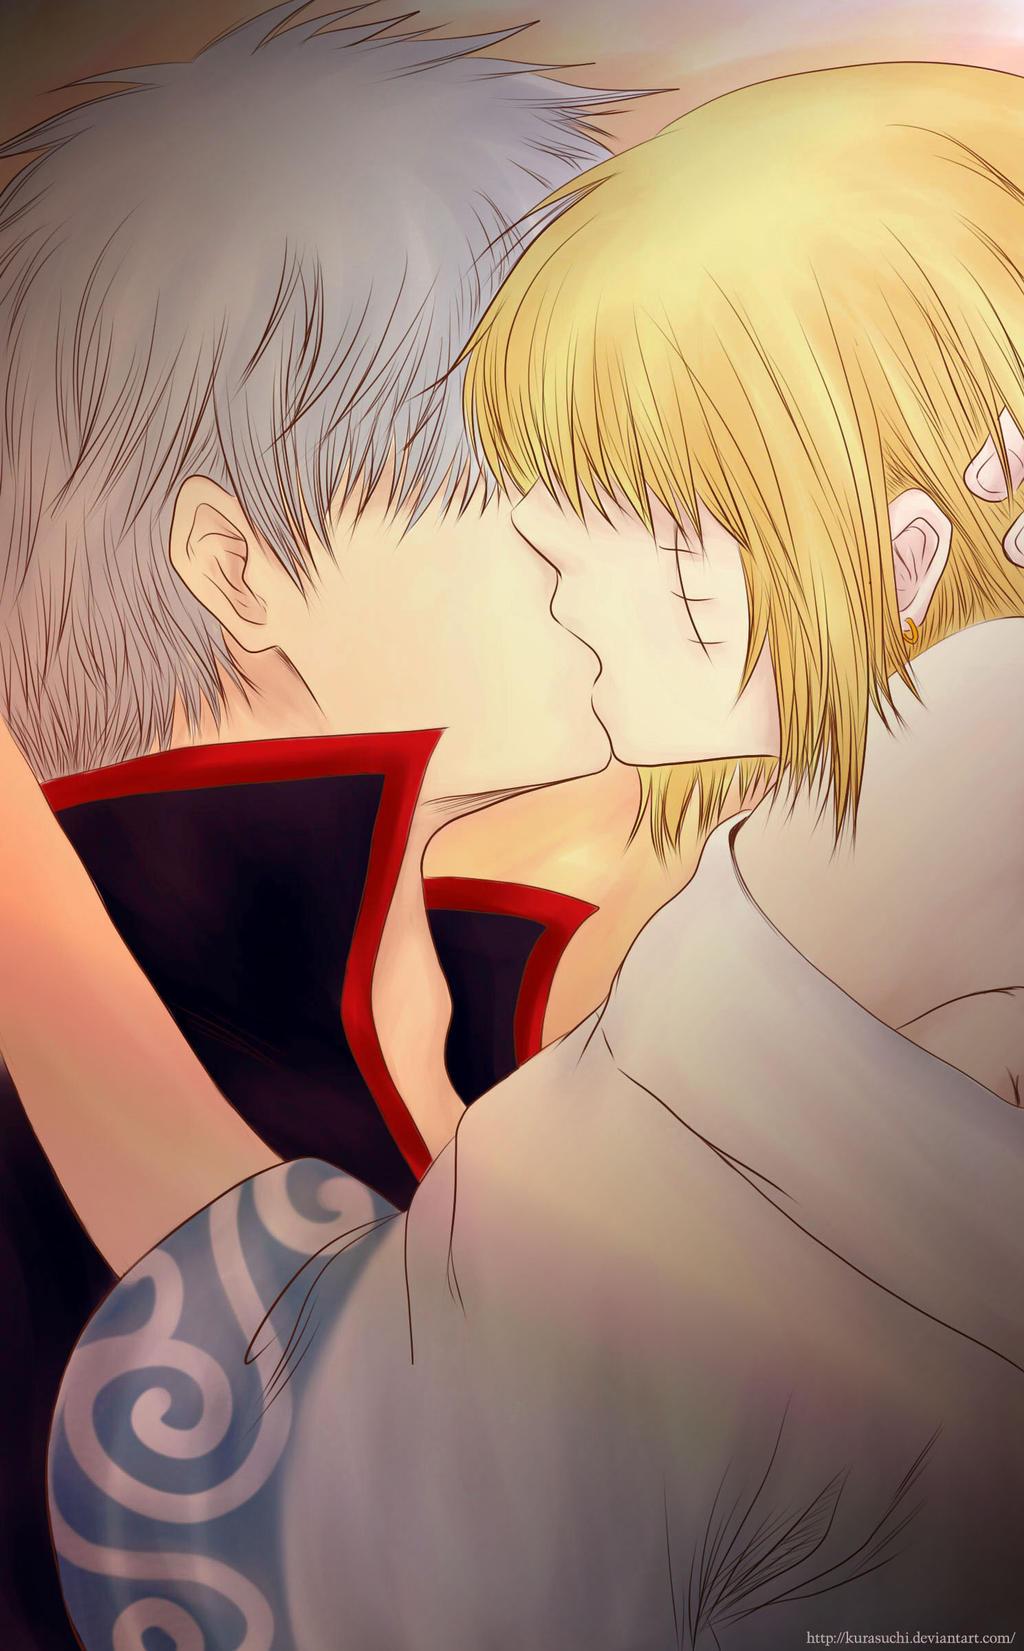 Gintoki And Tsukuyo Fanfiction  click to showhide